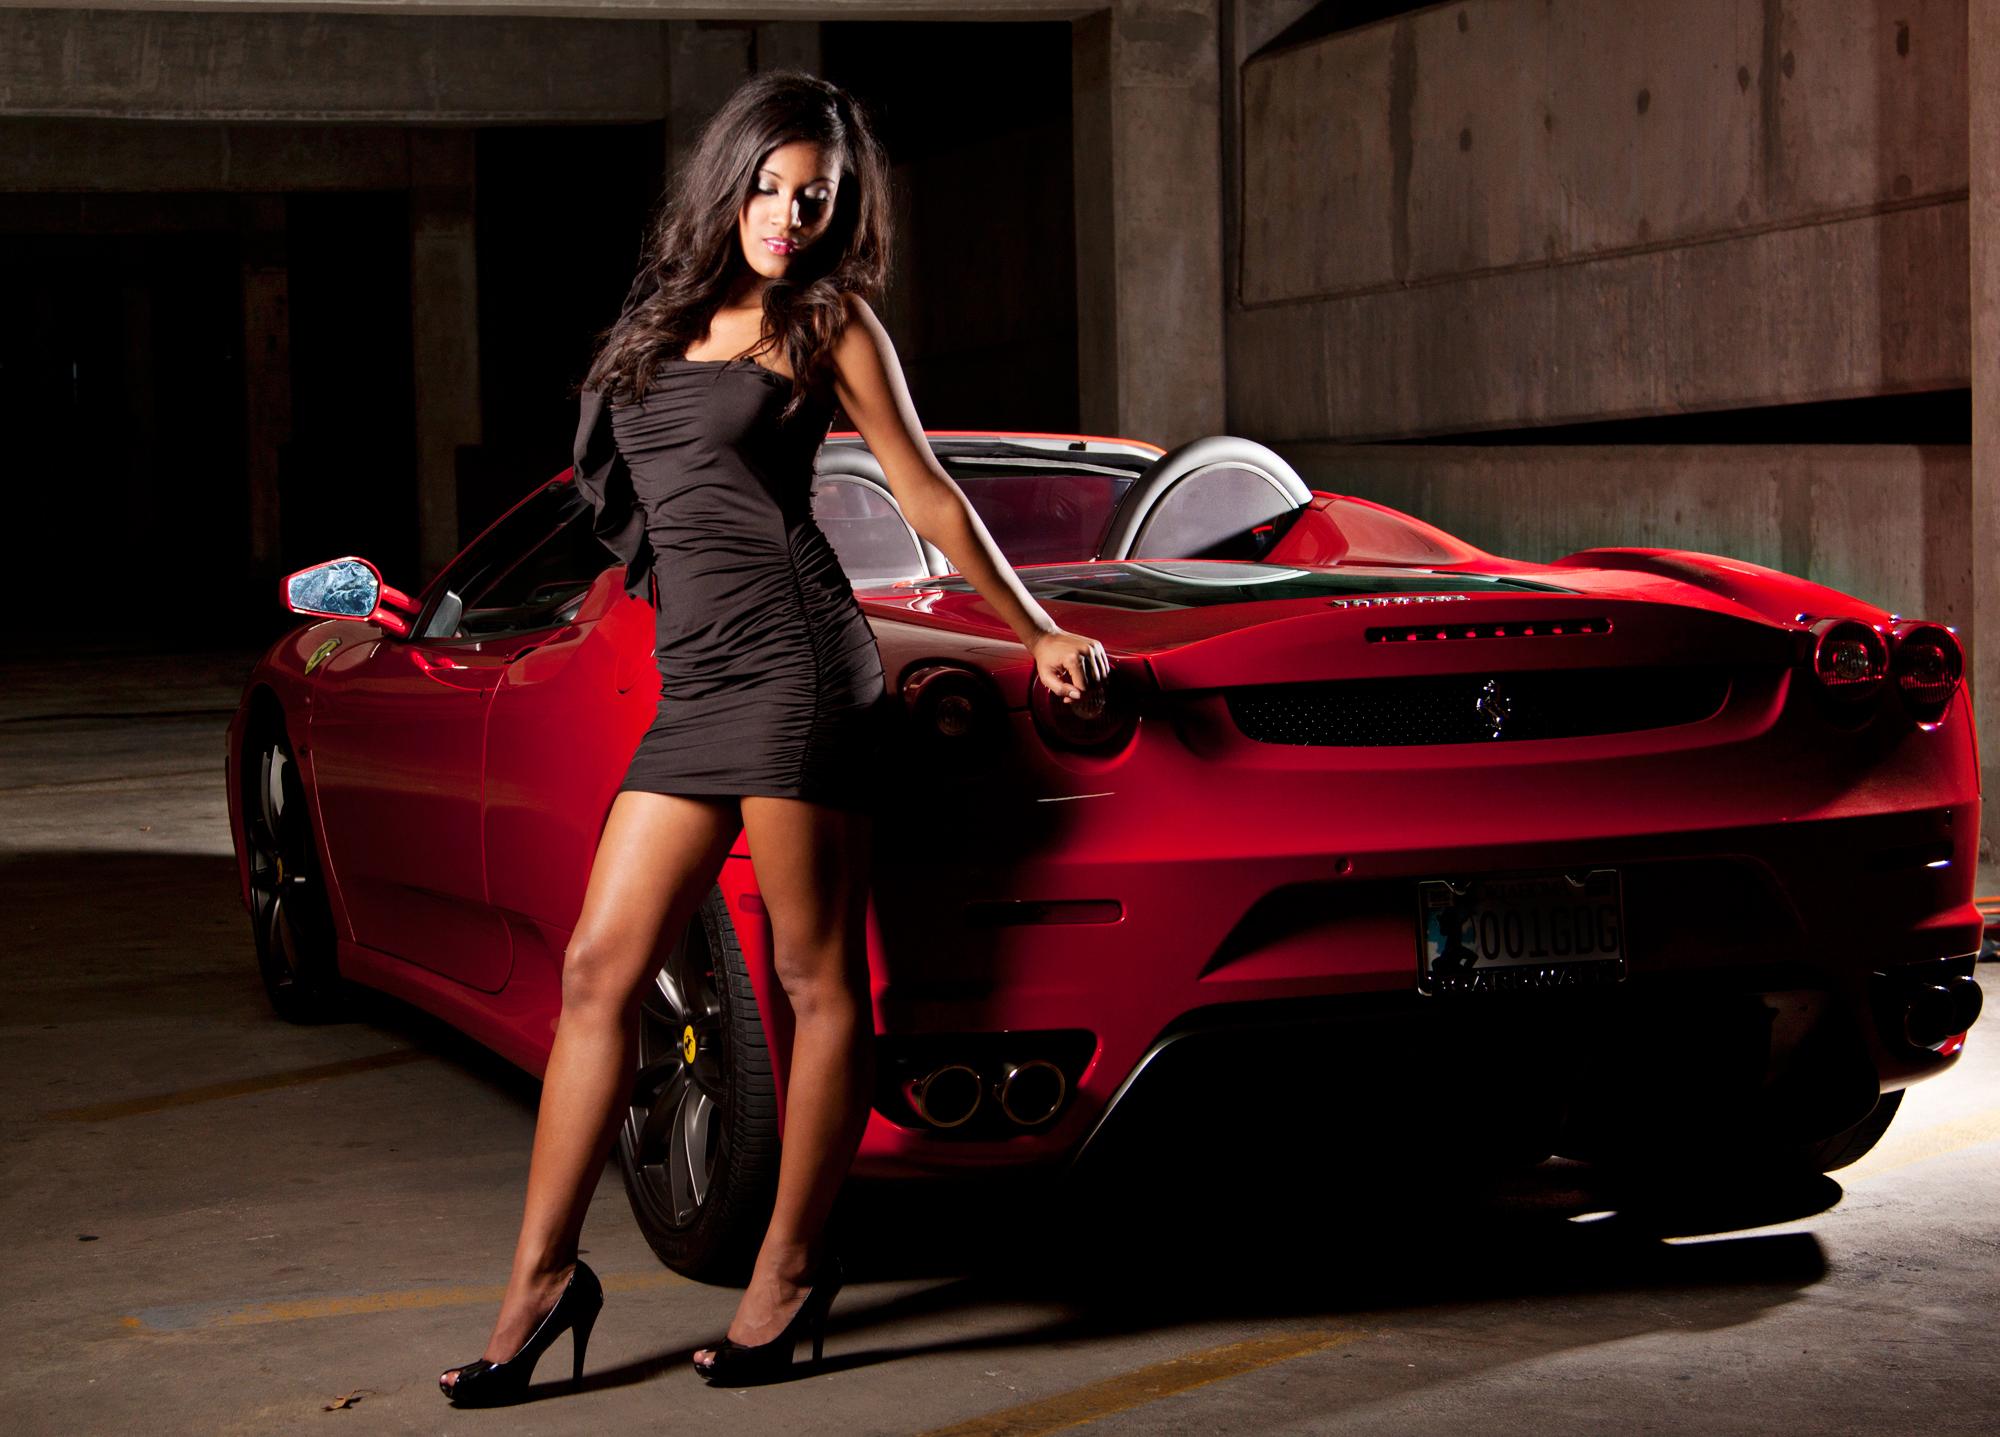 Ferrari F430 wallpaper 2000x1437 172741 WallpaperUP